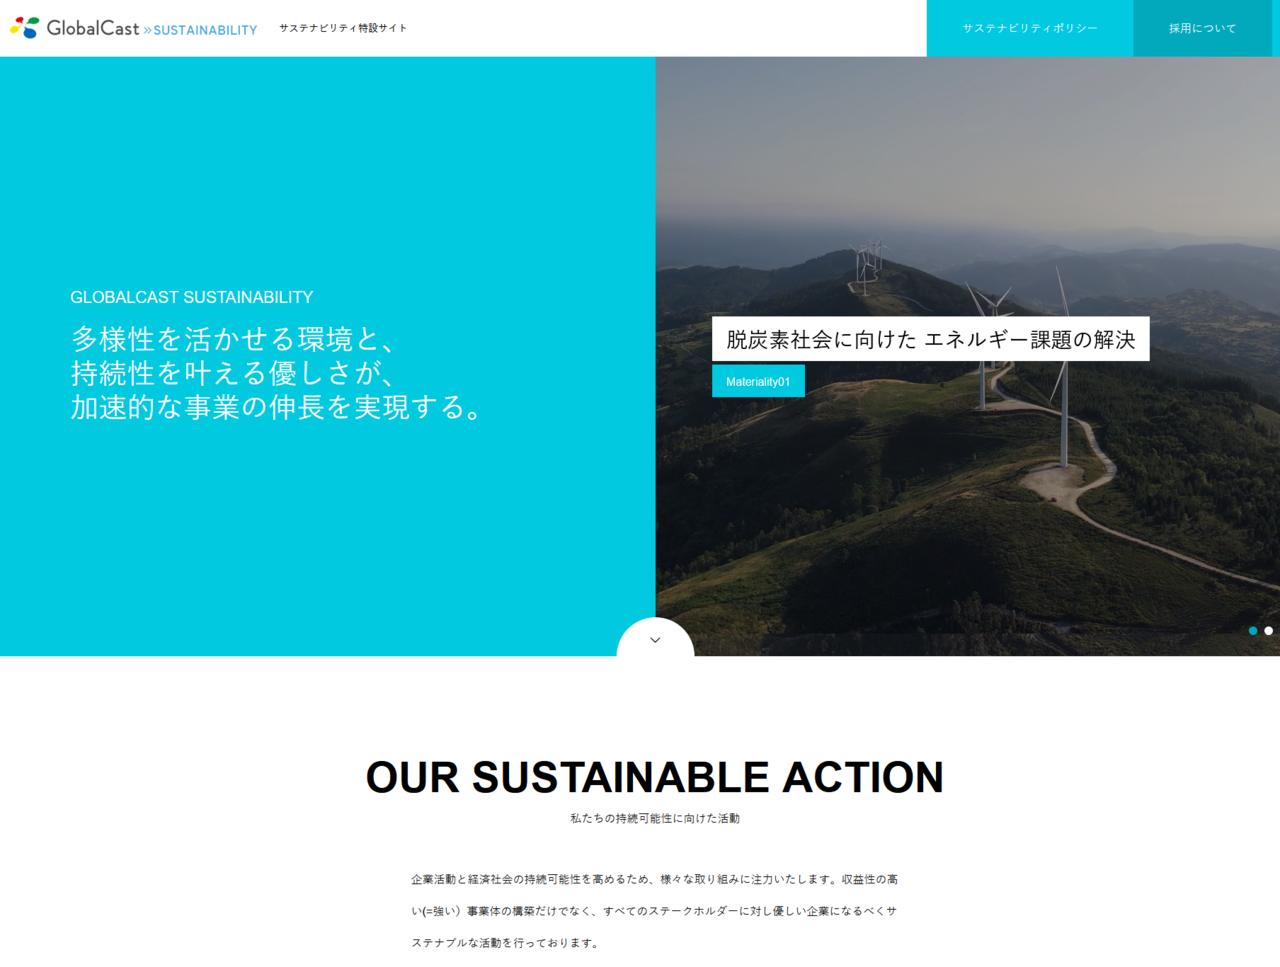 SDGsの取り組み状況や非財務情報を発信する特設サイト